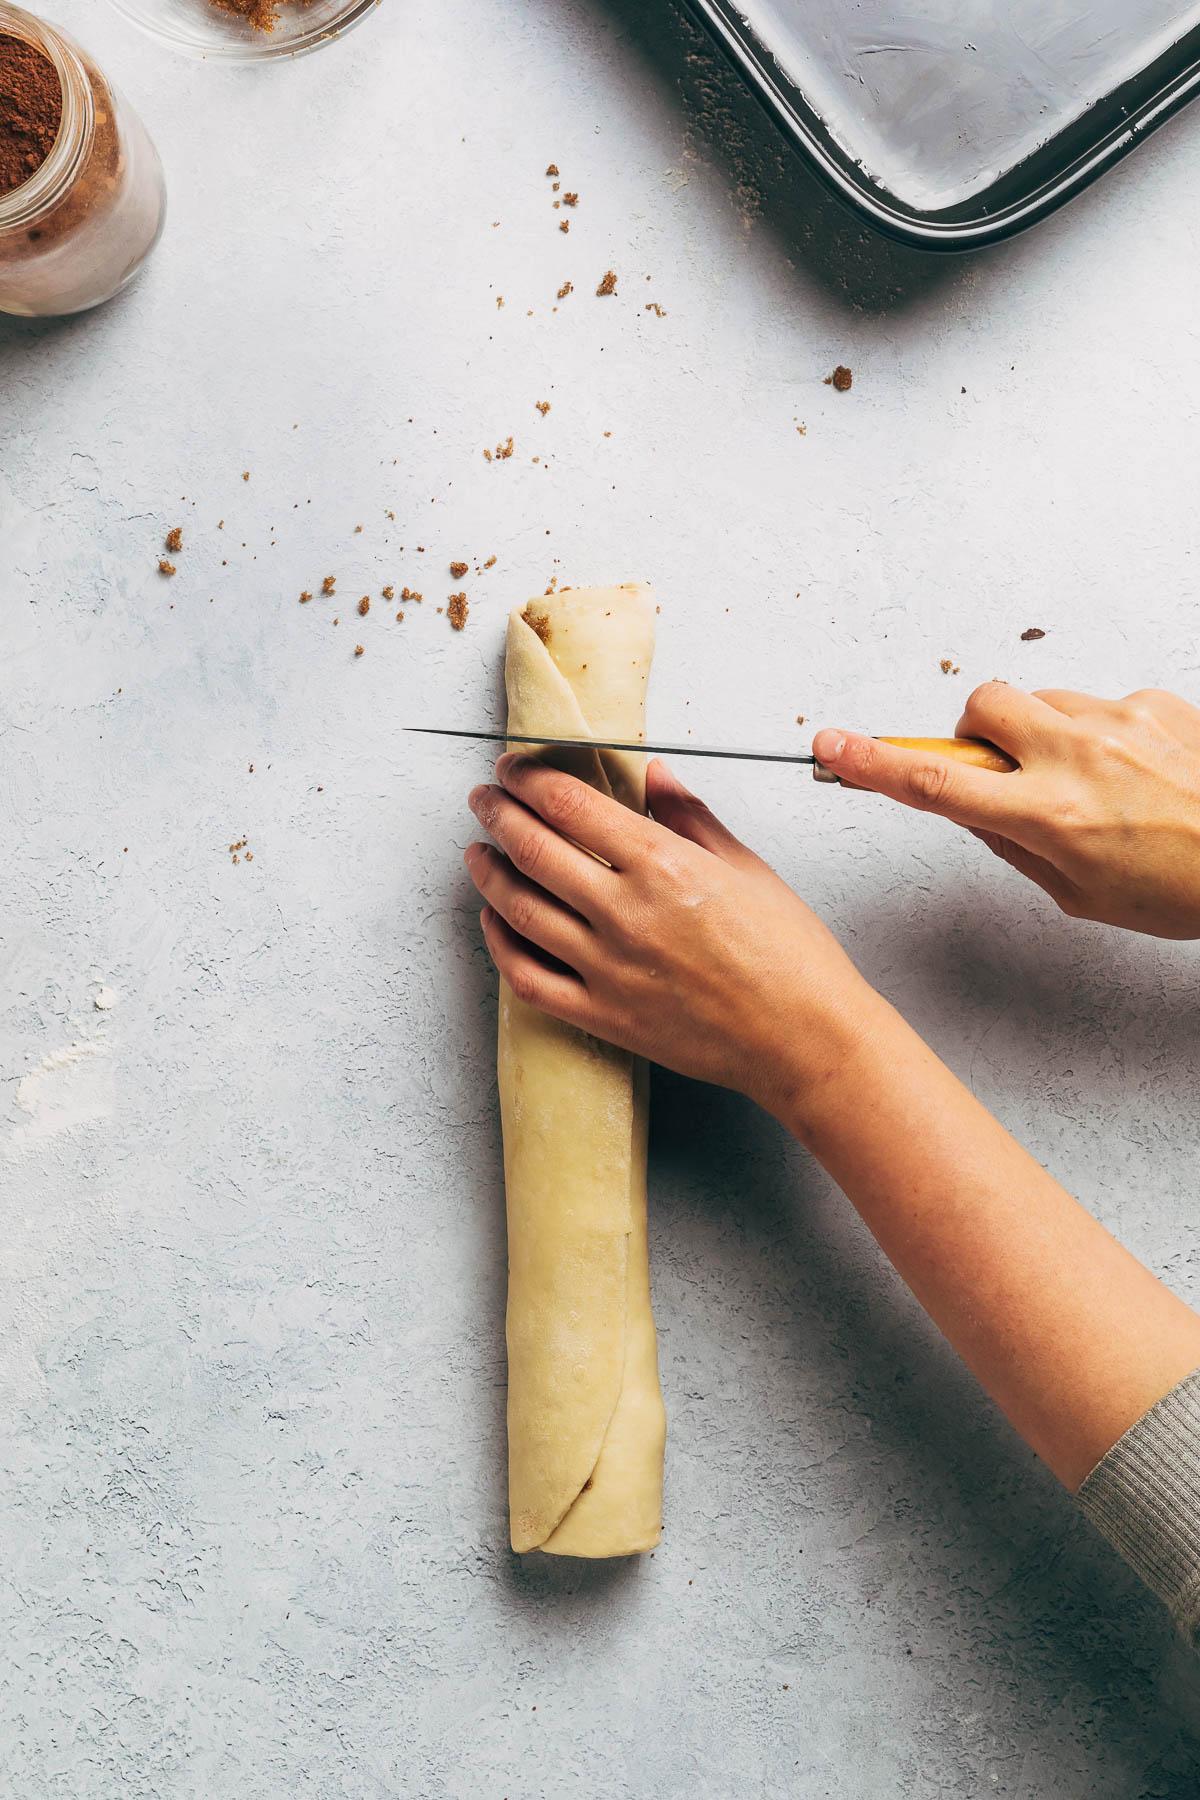 Cutting dough into individual rolls.